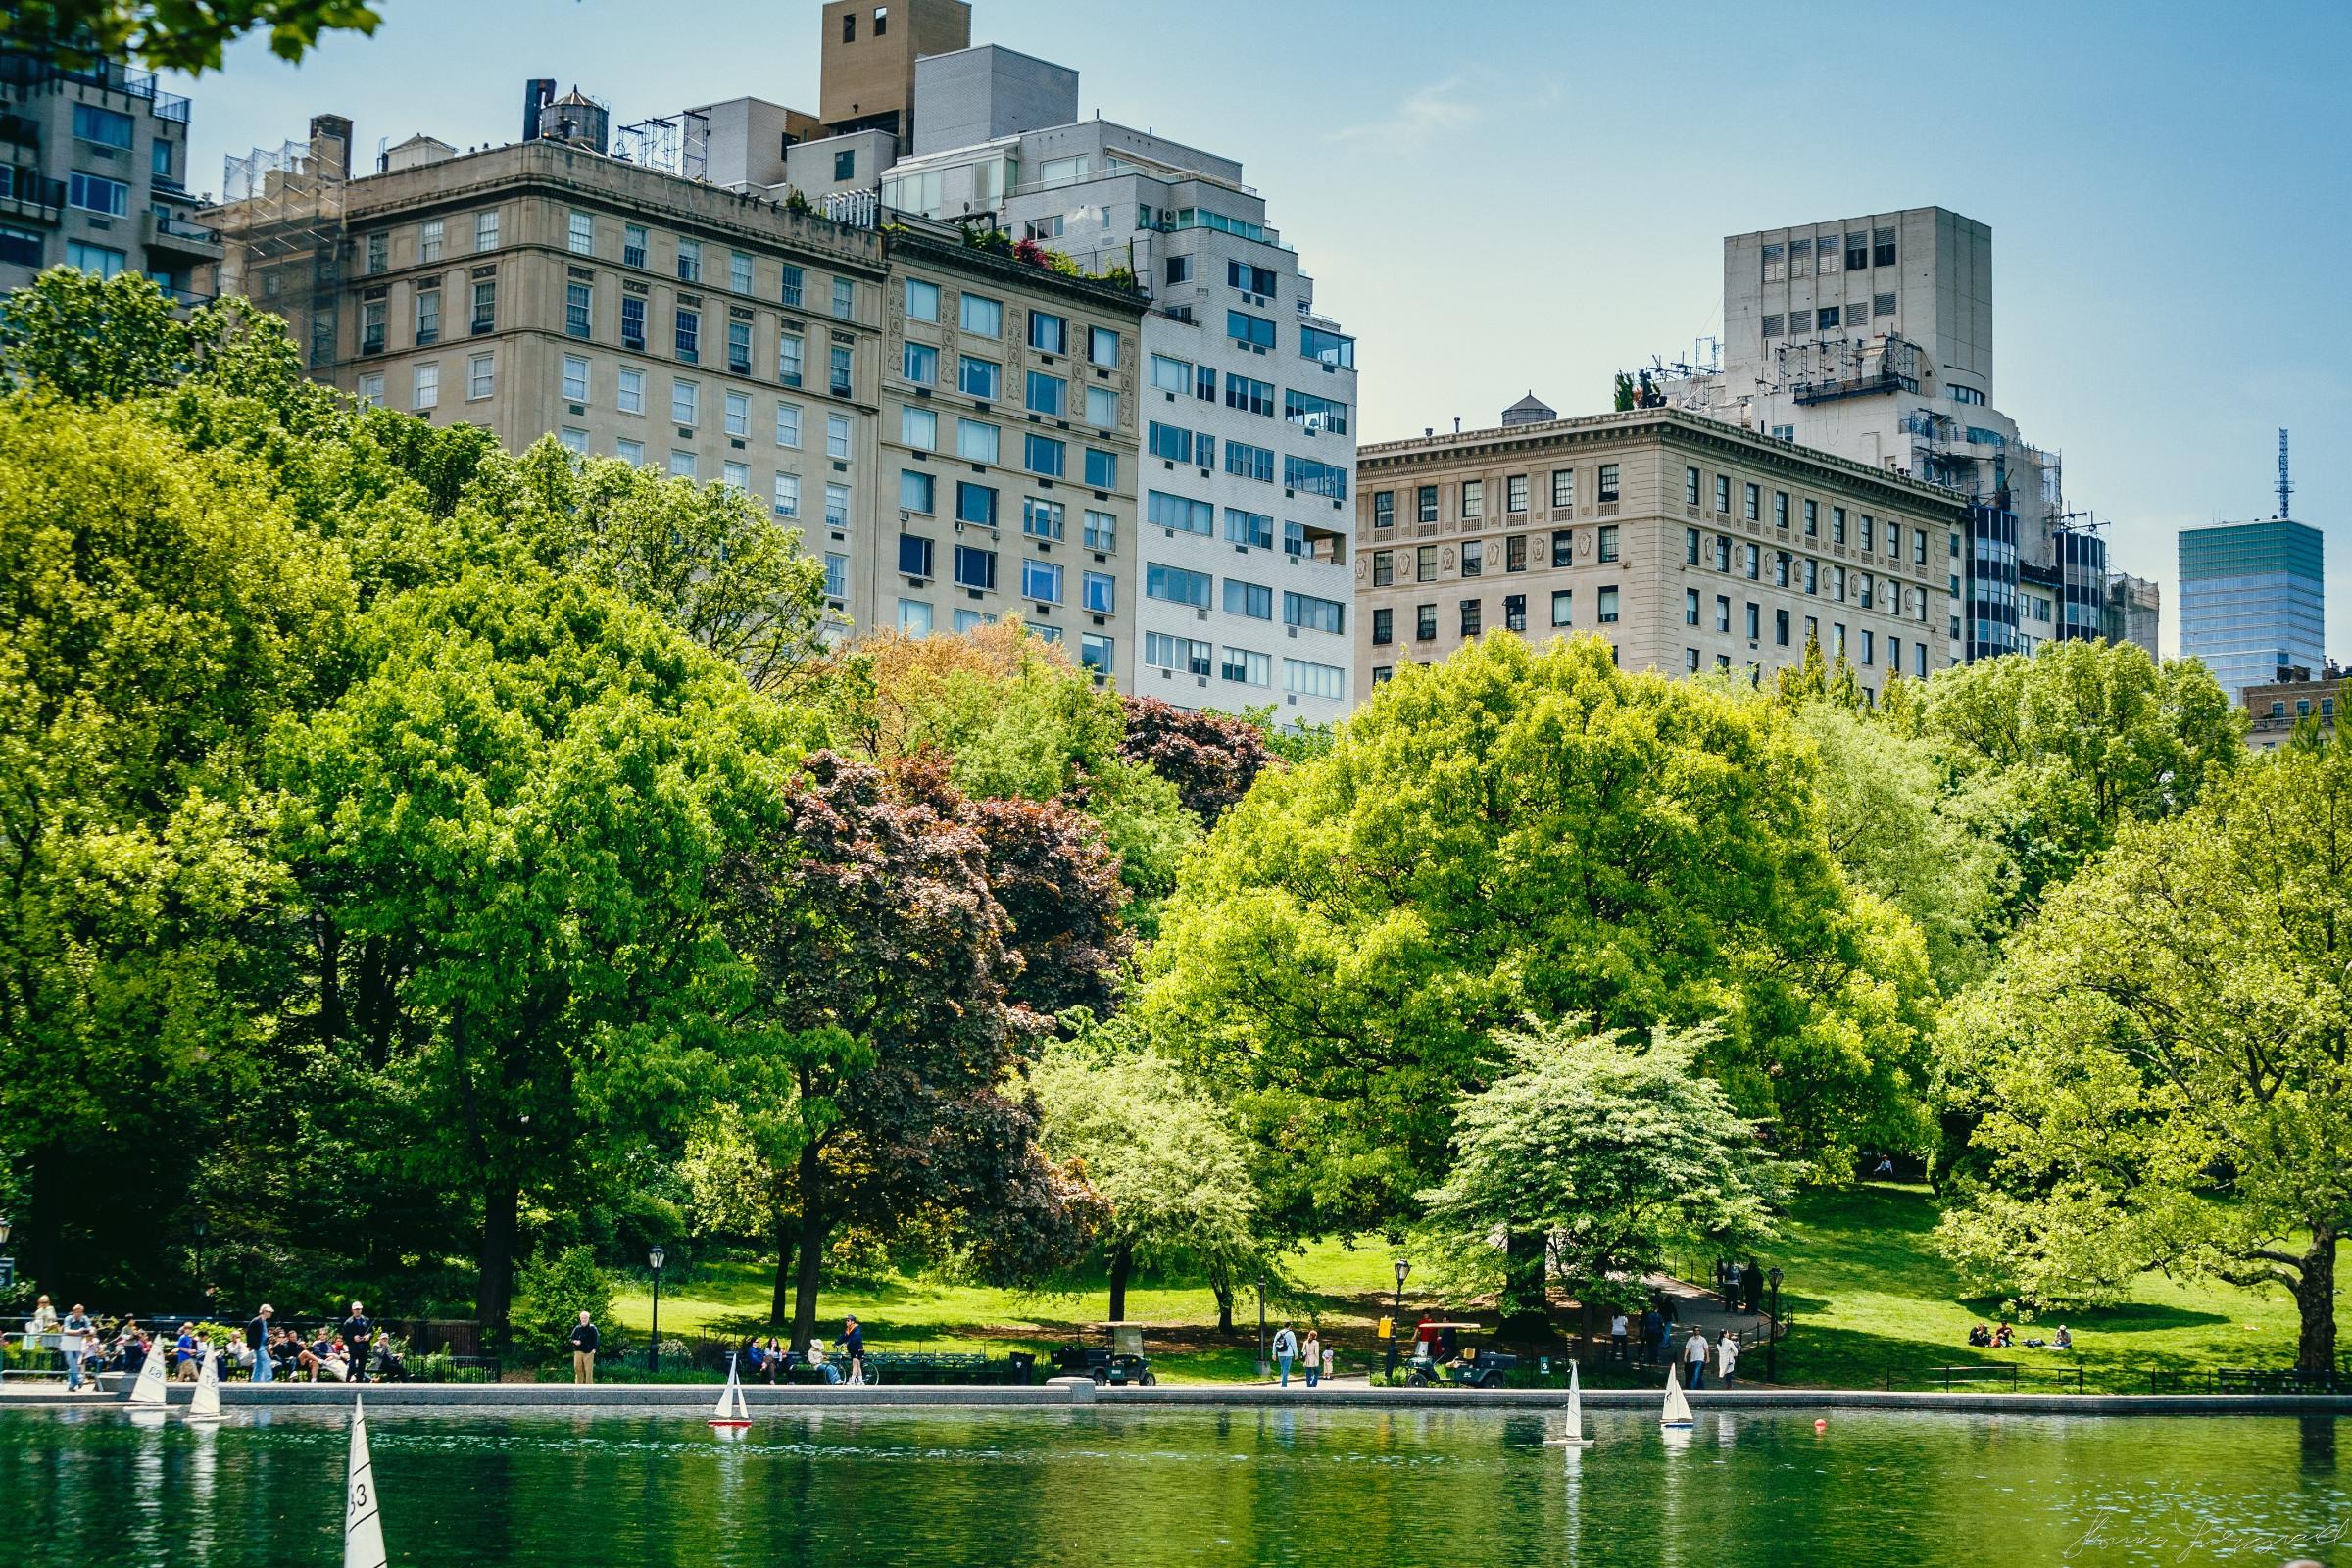 Central-Park-New-York-City-6.jpg